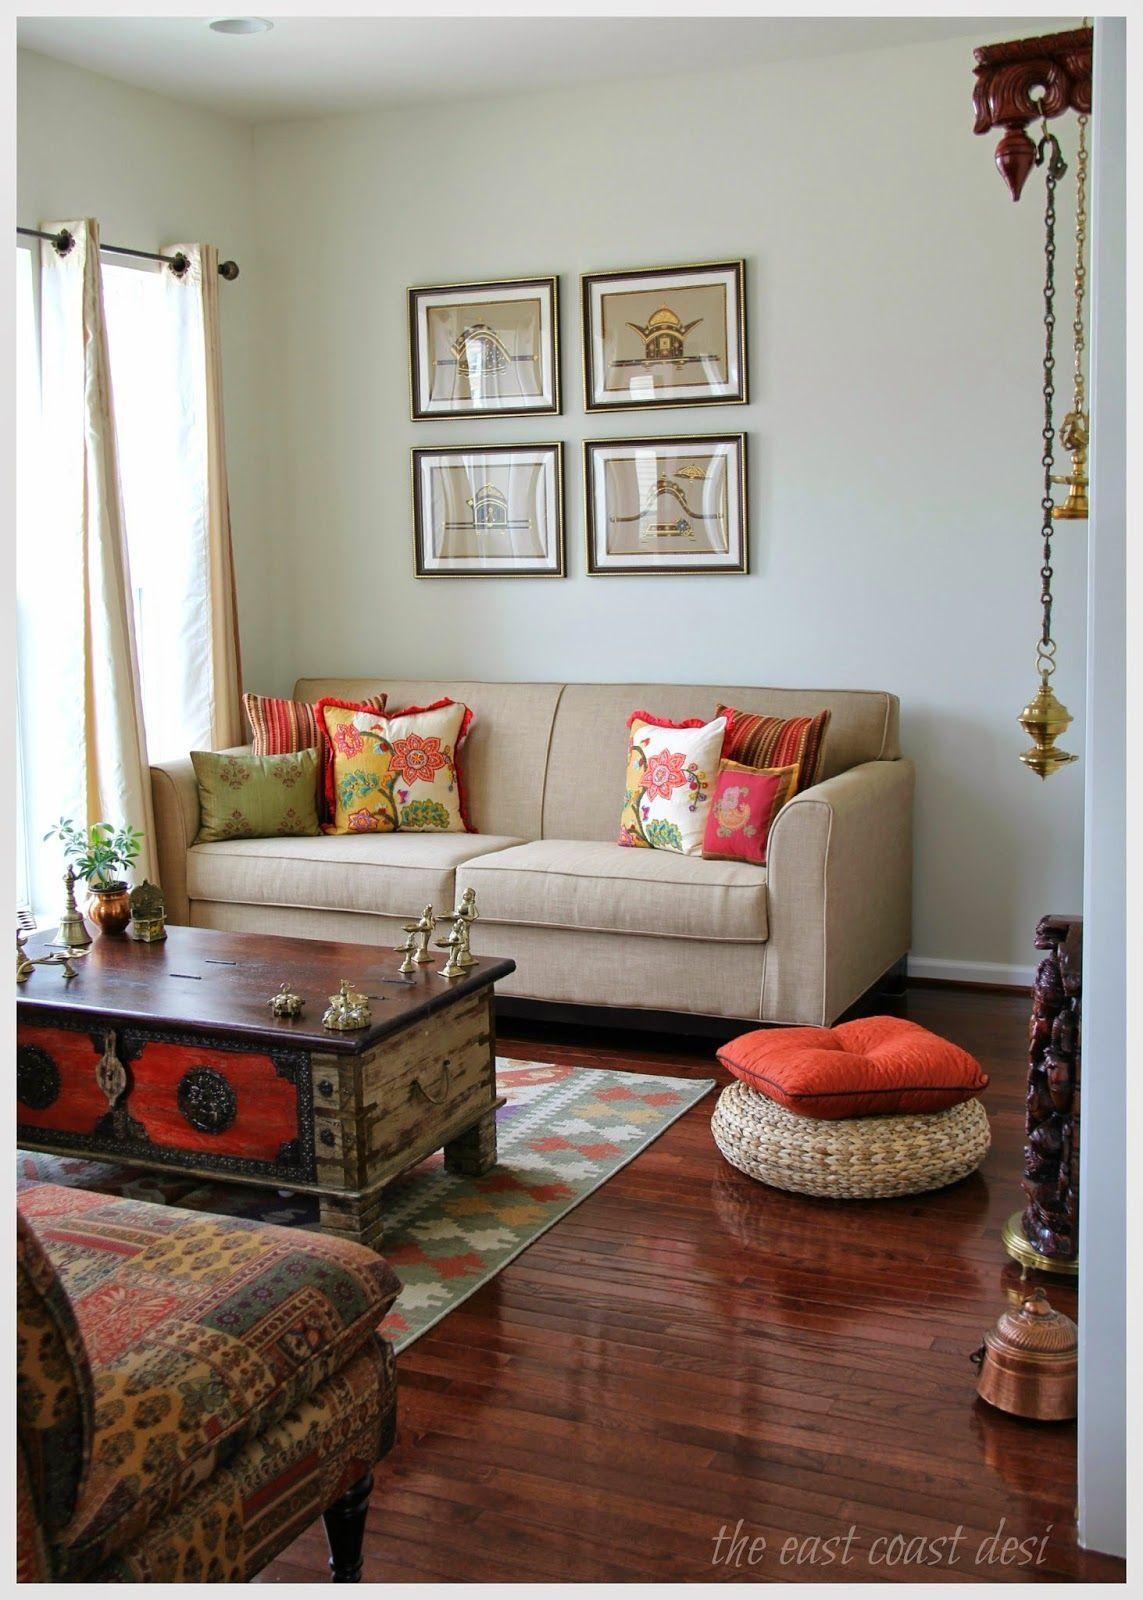 Curated Home Vs Decorated Home Decoracion Casa Pinterest Small